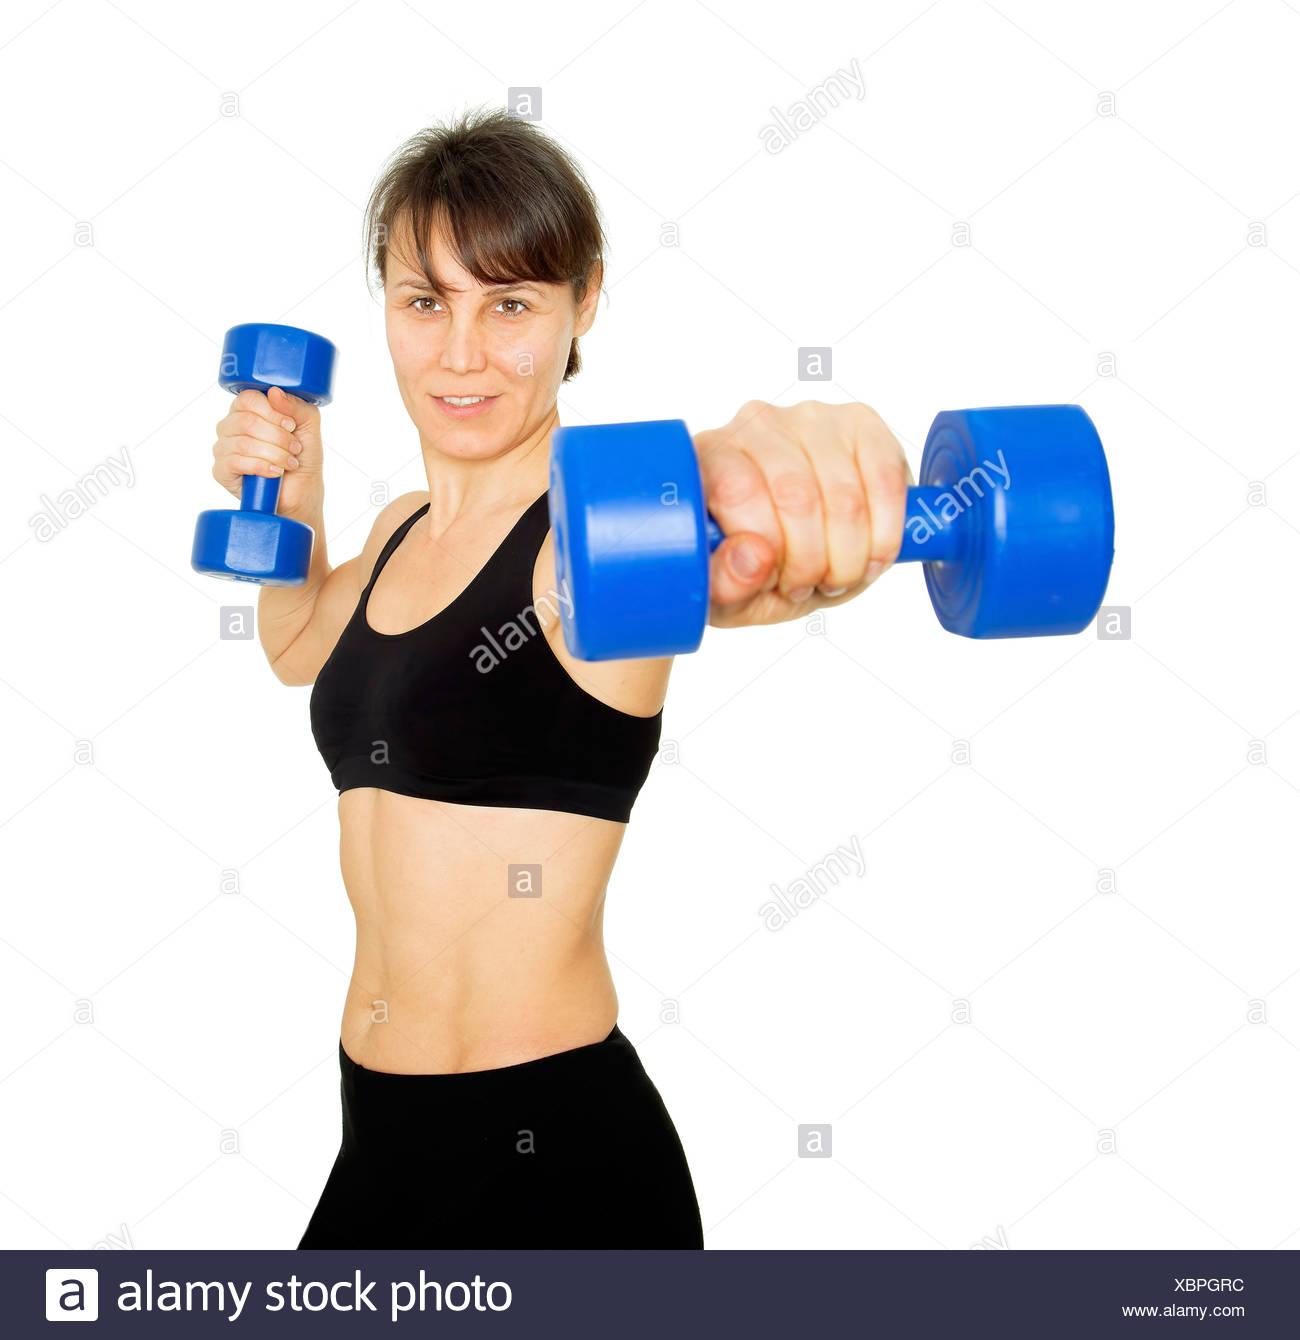 Sollevamento pesi Immagini Stock